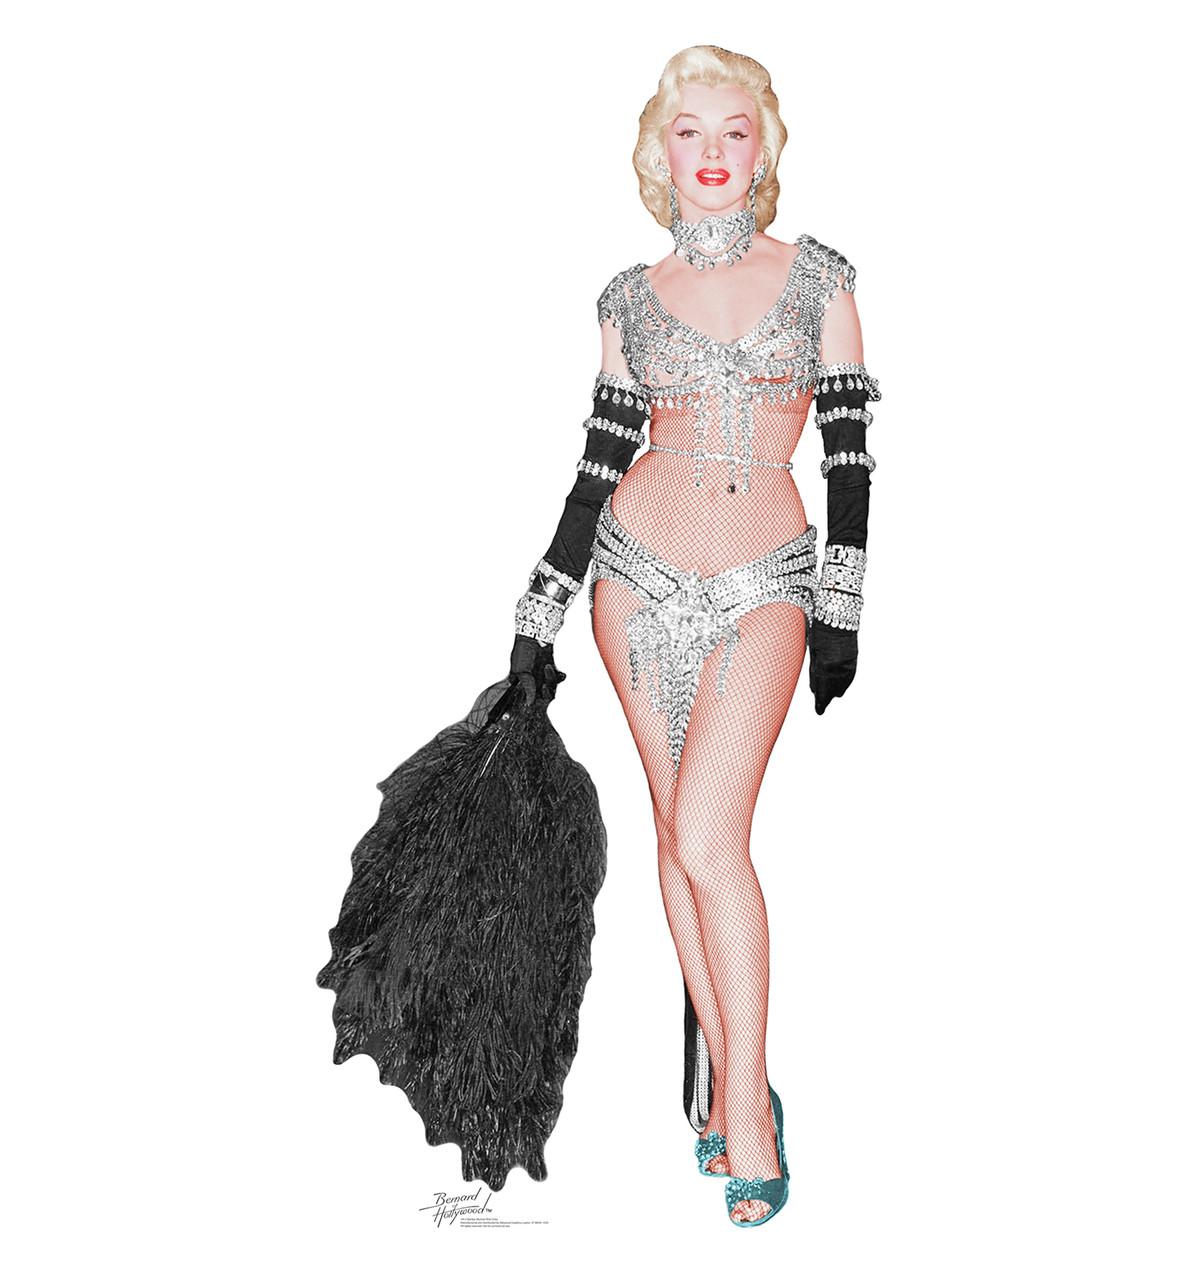 Life-size Marilyn Monroe - Showgirl Cardboard Standup